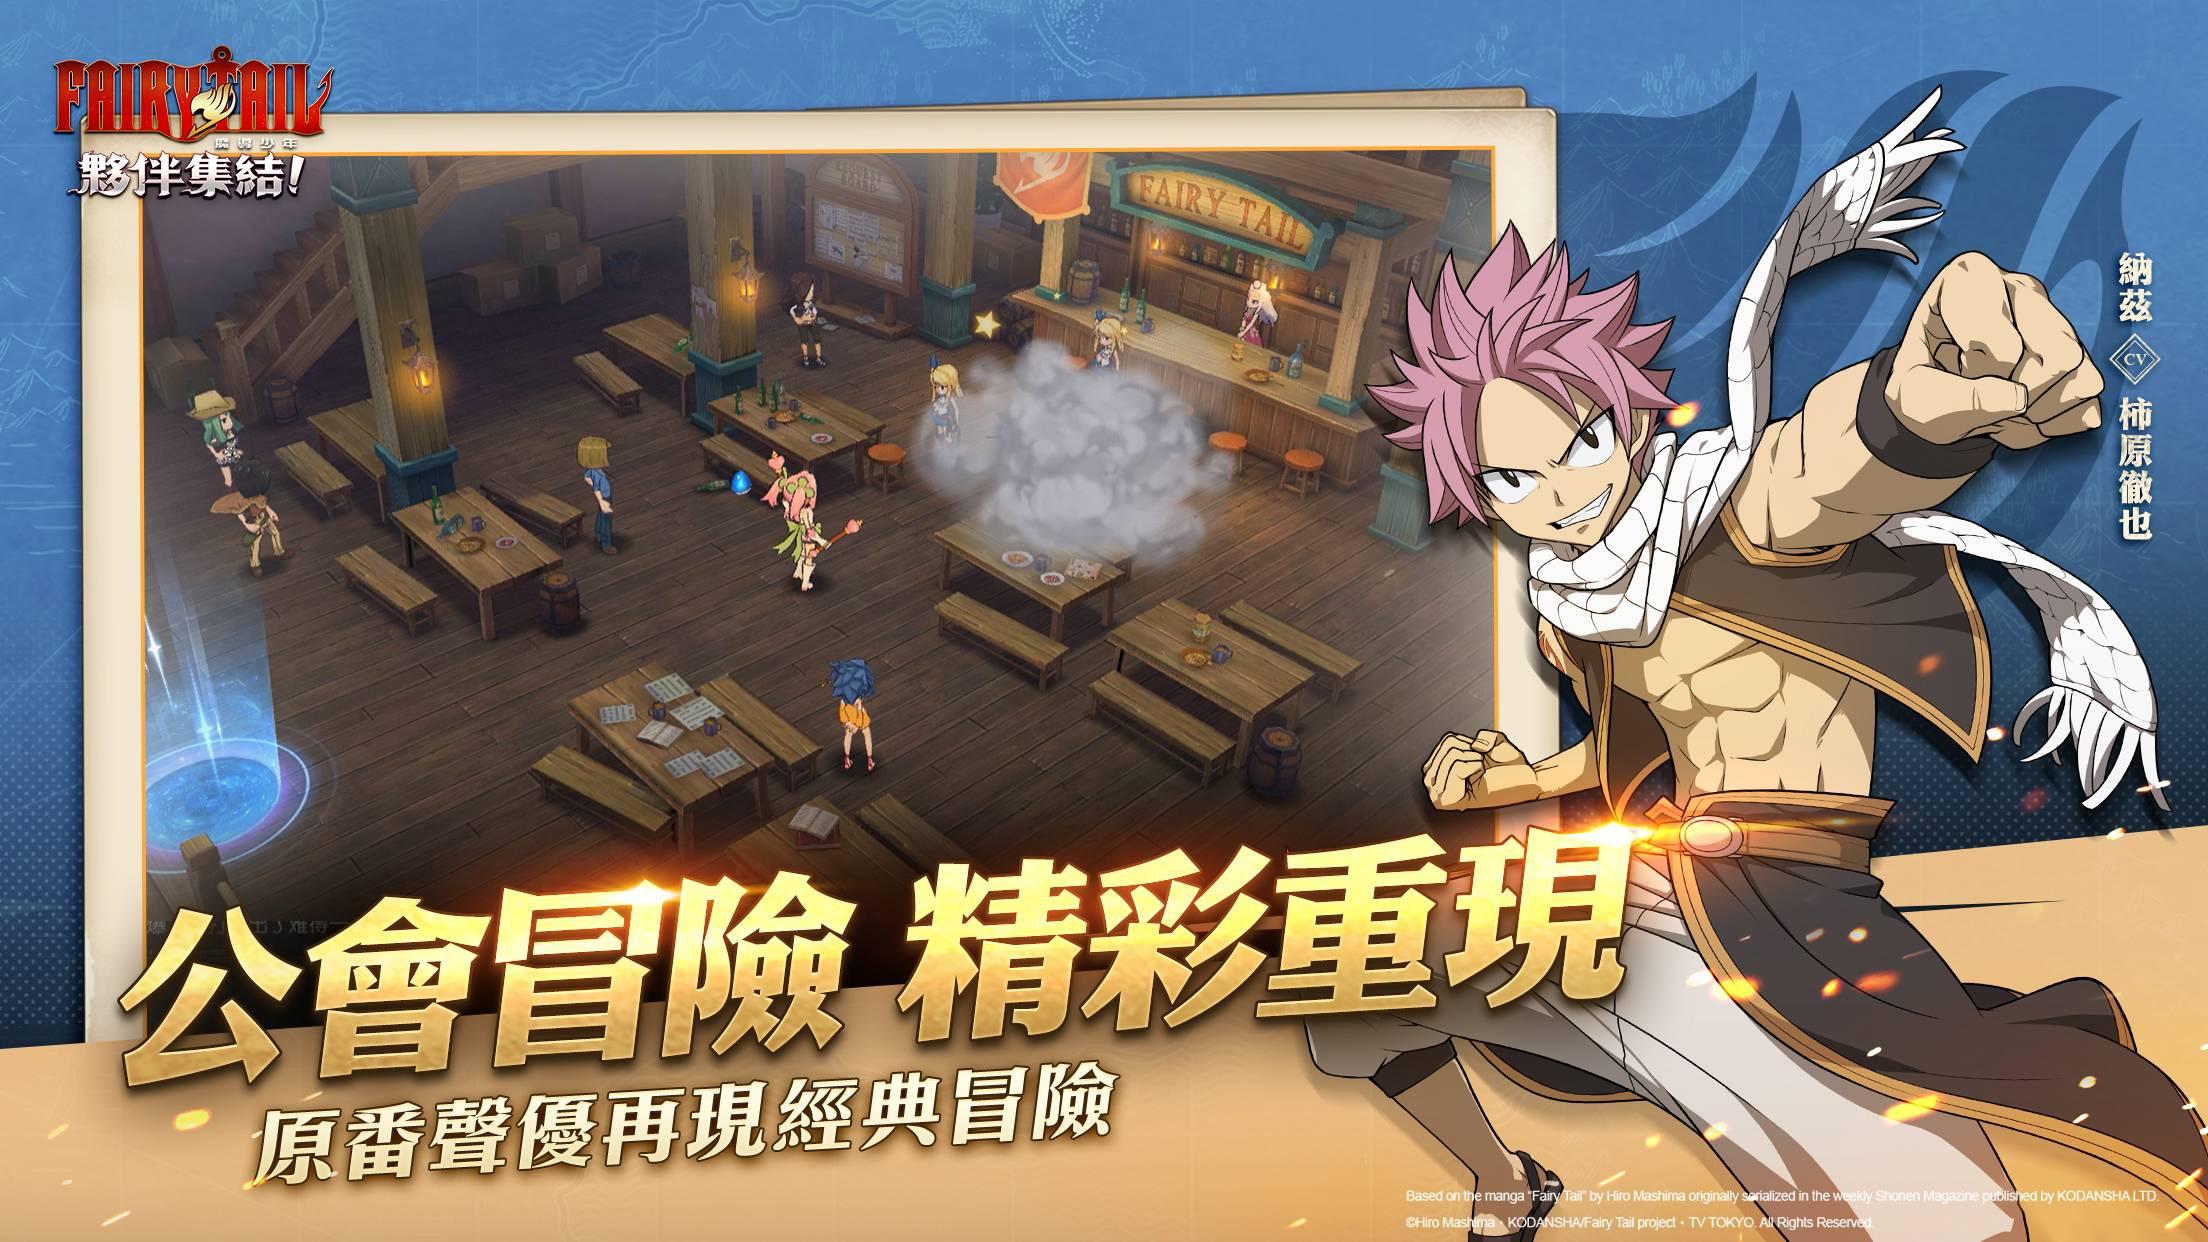 RPG 手遊《魔導少年:夥伴集結!》10月21日正式公測! 問鼎最強公會 與夥伴一起前進專屬秘密基地!